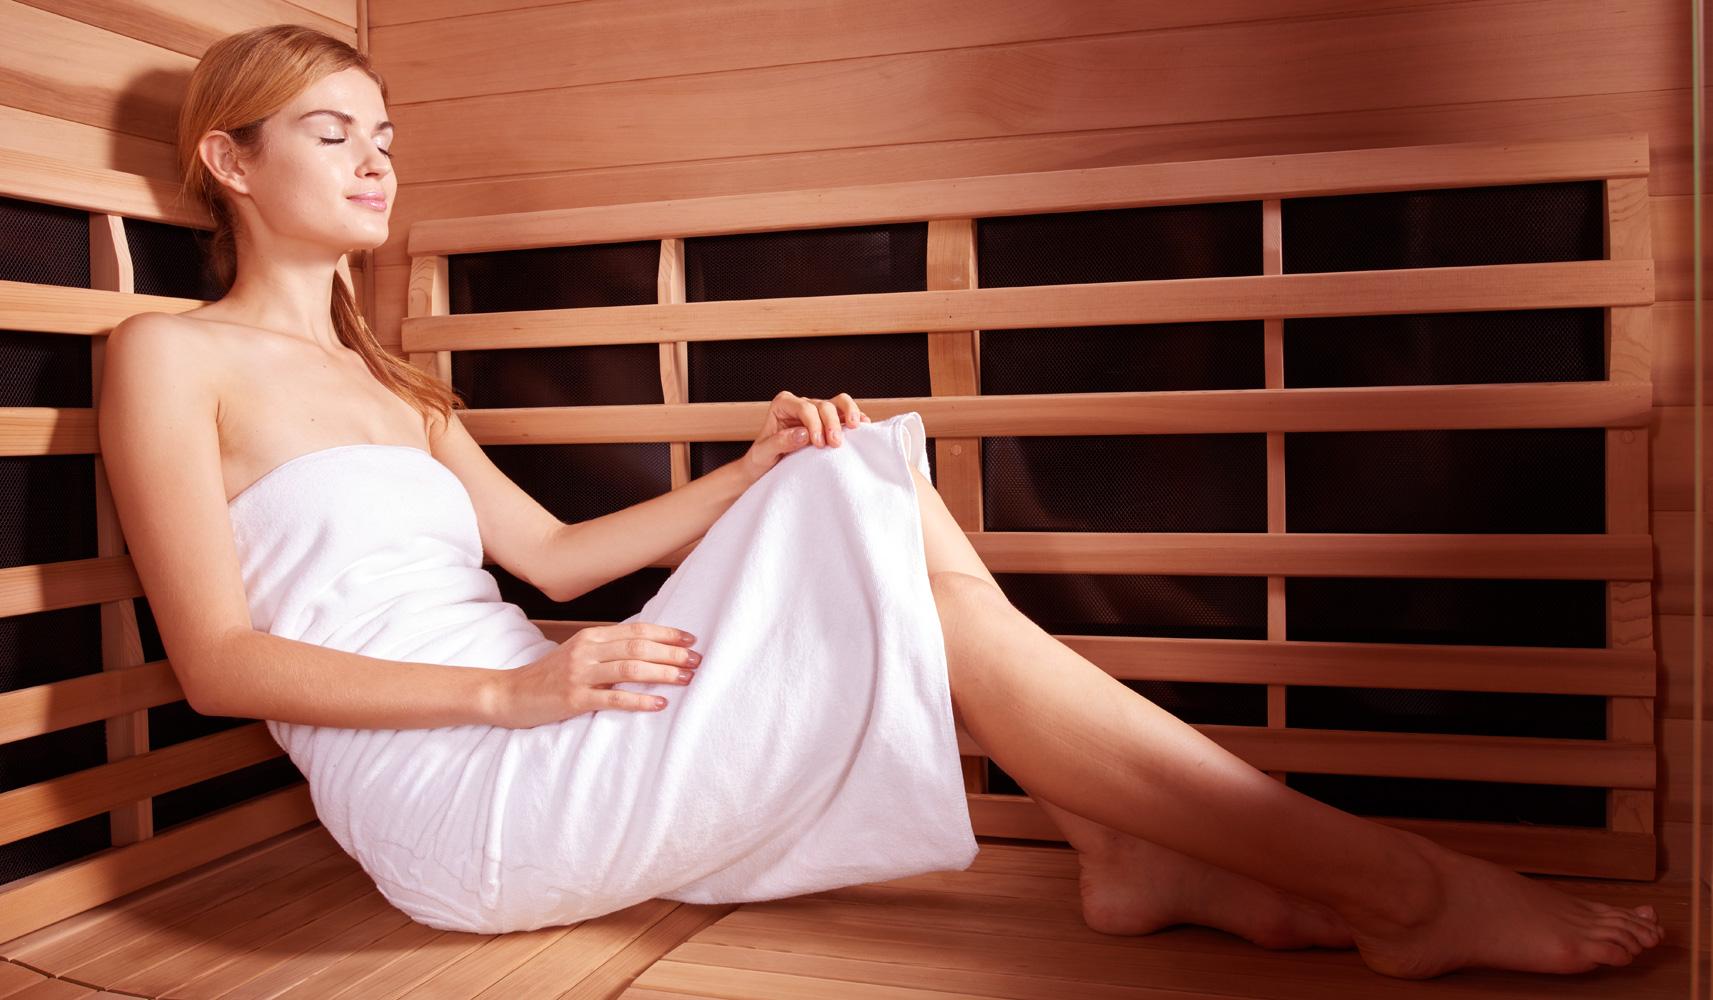 saunaModel-Reclining.jpg